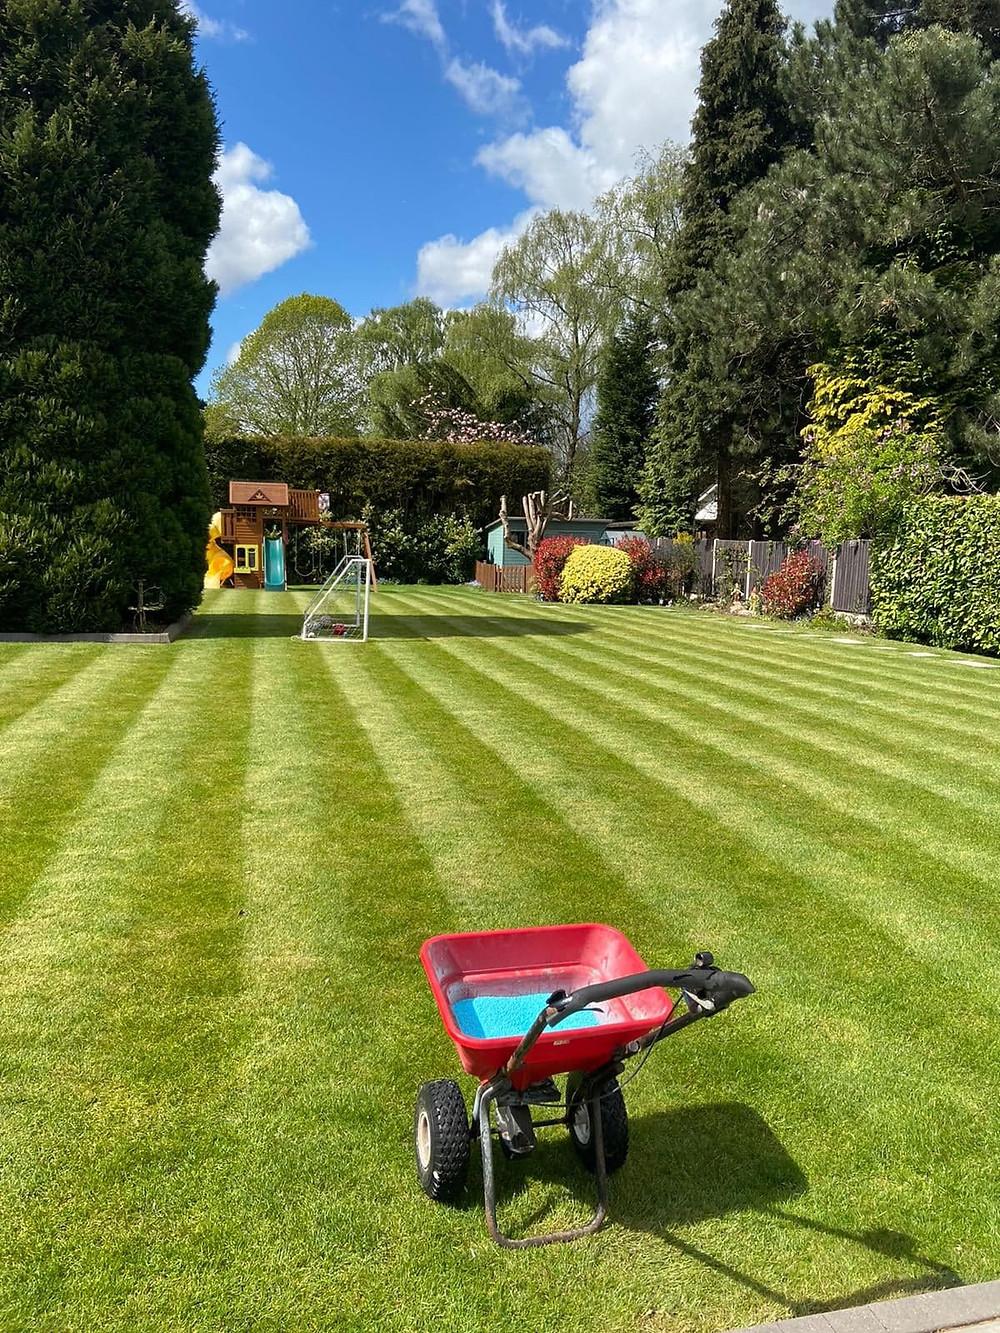 Kingsbury Lawn Care | Lawn Treatment Service | Mental Health Awareness